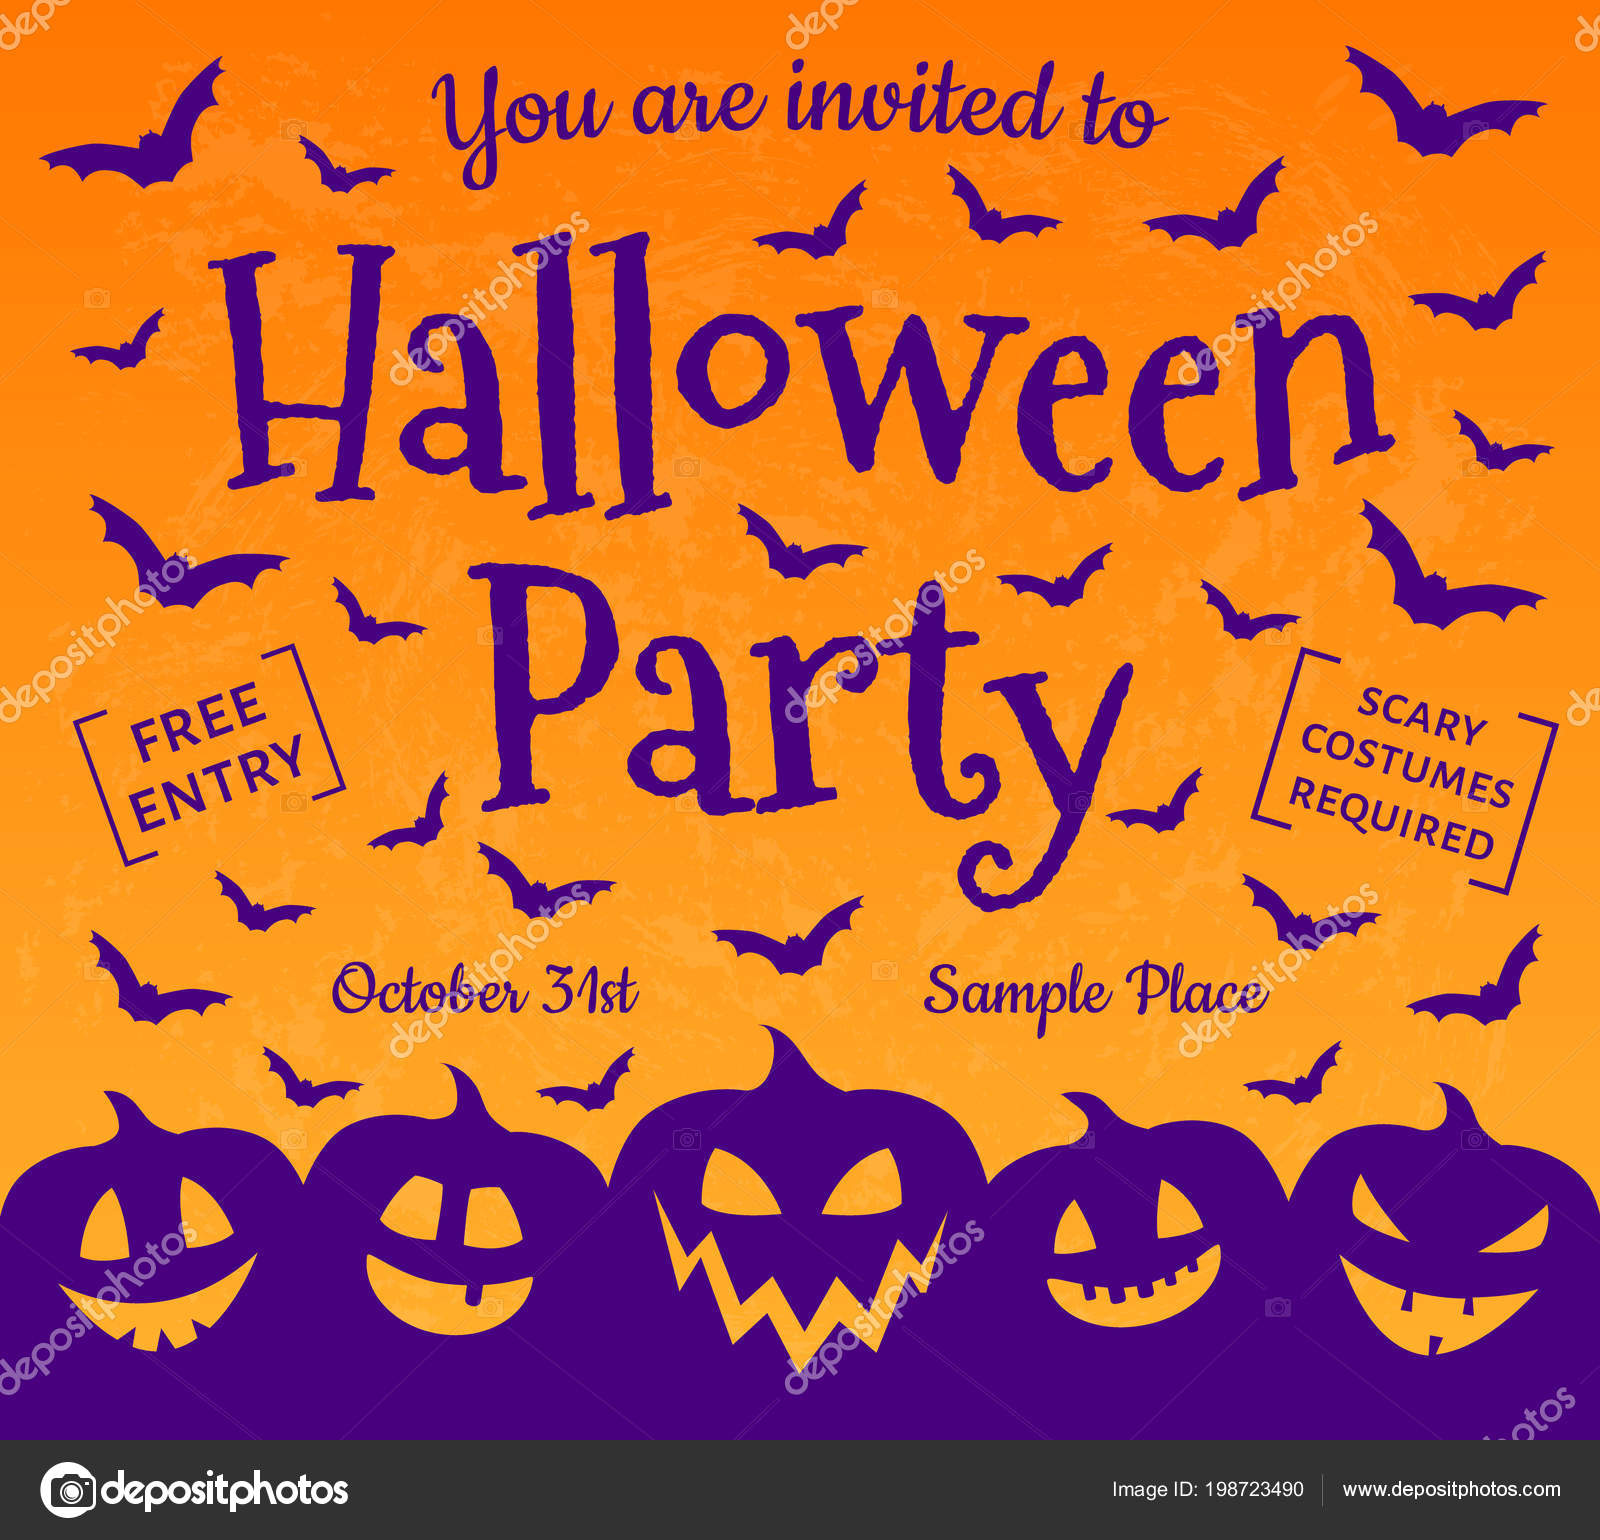 Scary invitation halloween party vector vetores de stock scary invitation halloween party vector vetores de stock stopboris Images